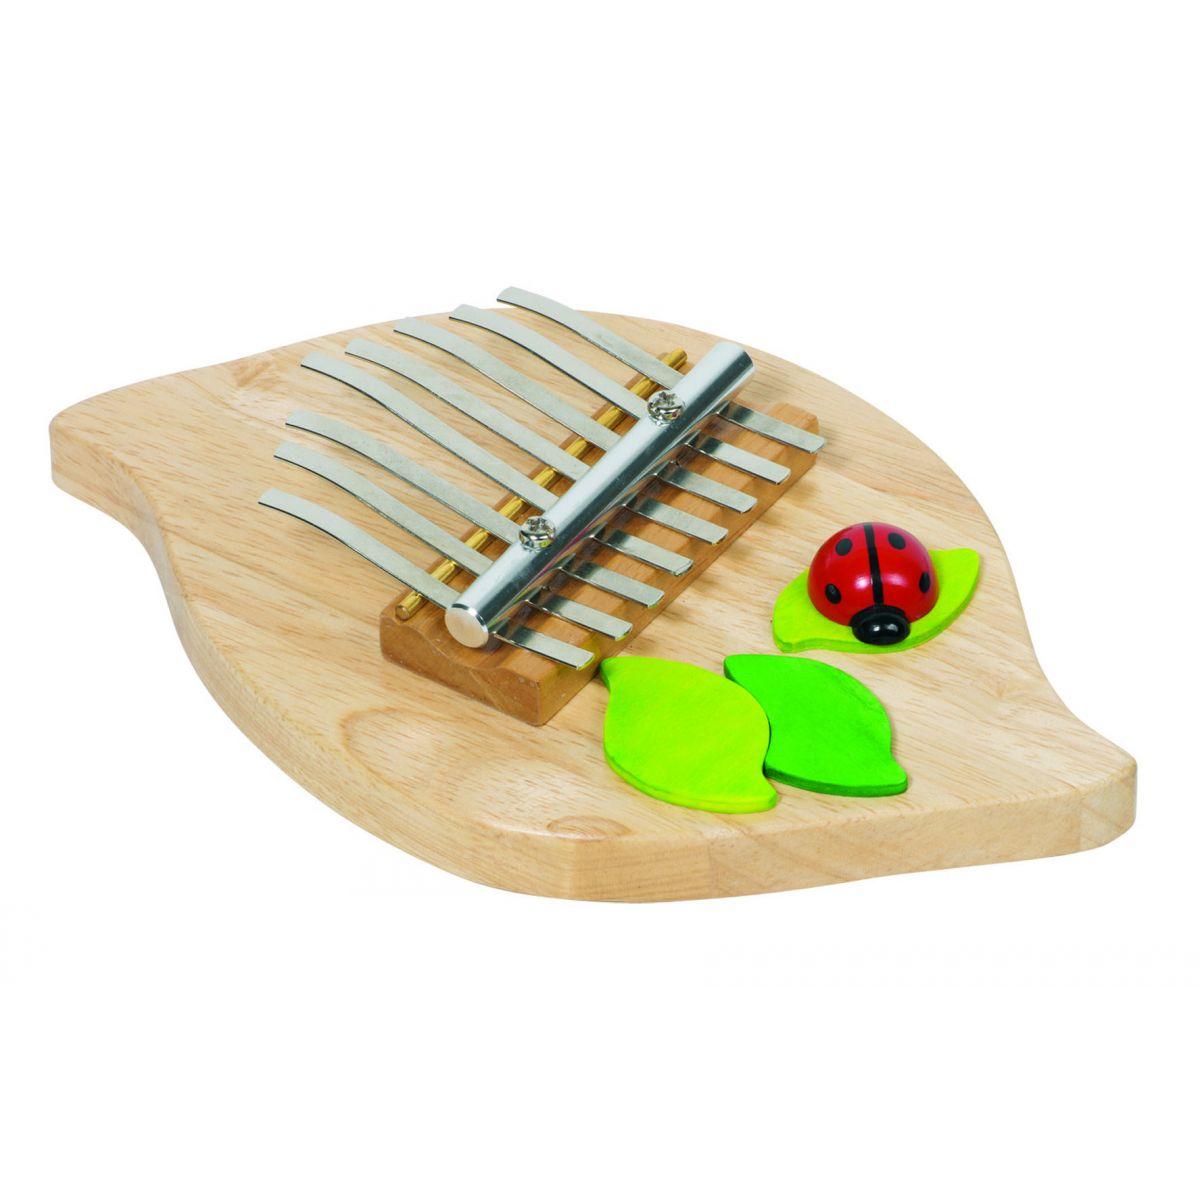 piano kalimba en bois coccinelle partir de 5 ans sebio. Black Bedroom Furniture Sets. Home Design Ideas